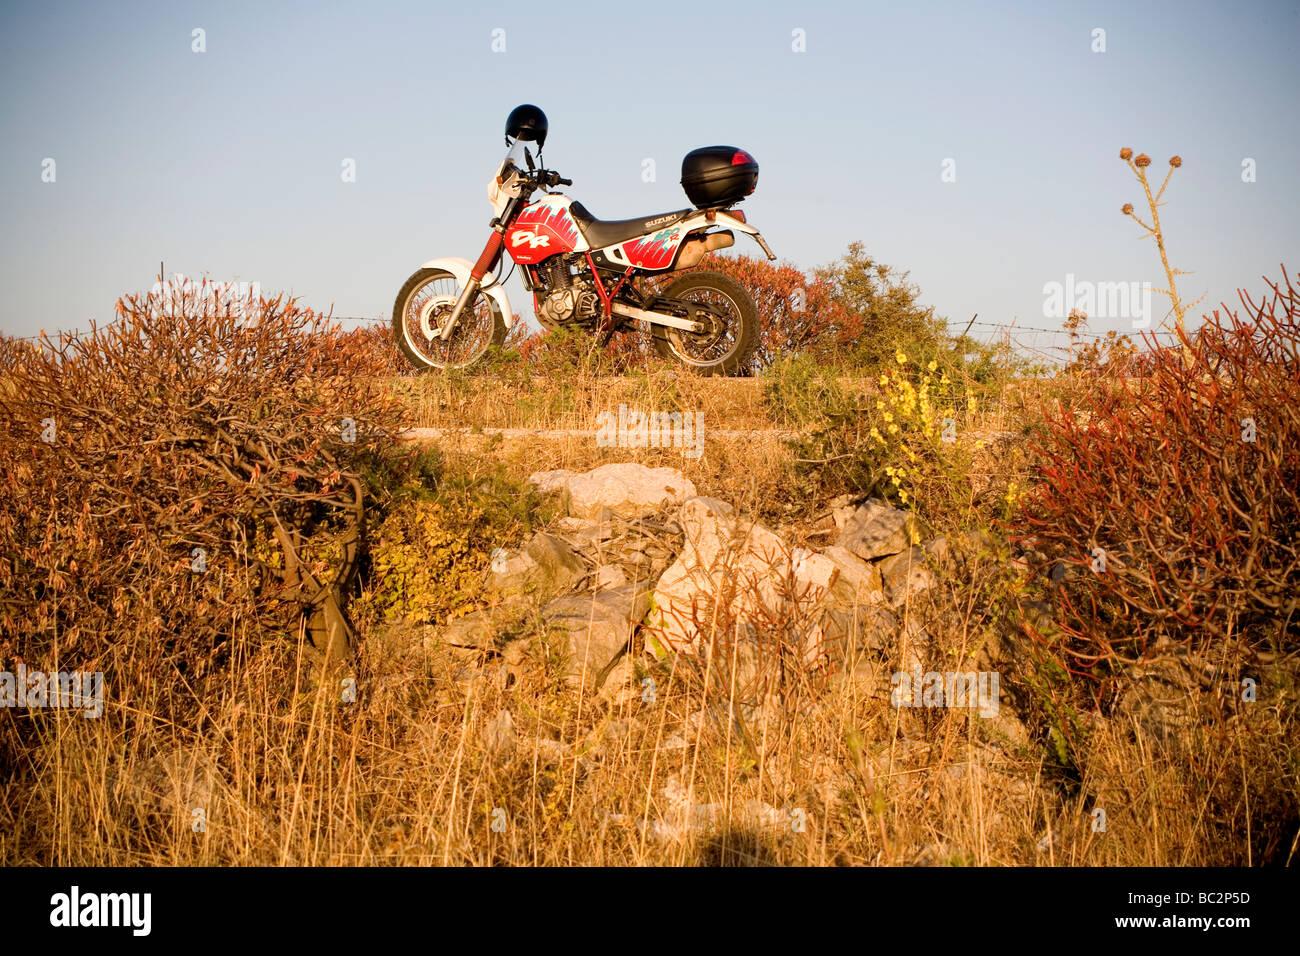 Suzuki DR 650 off road Bike in countryside - Stock Image